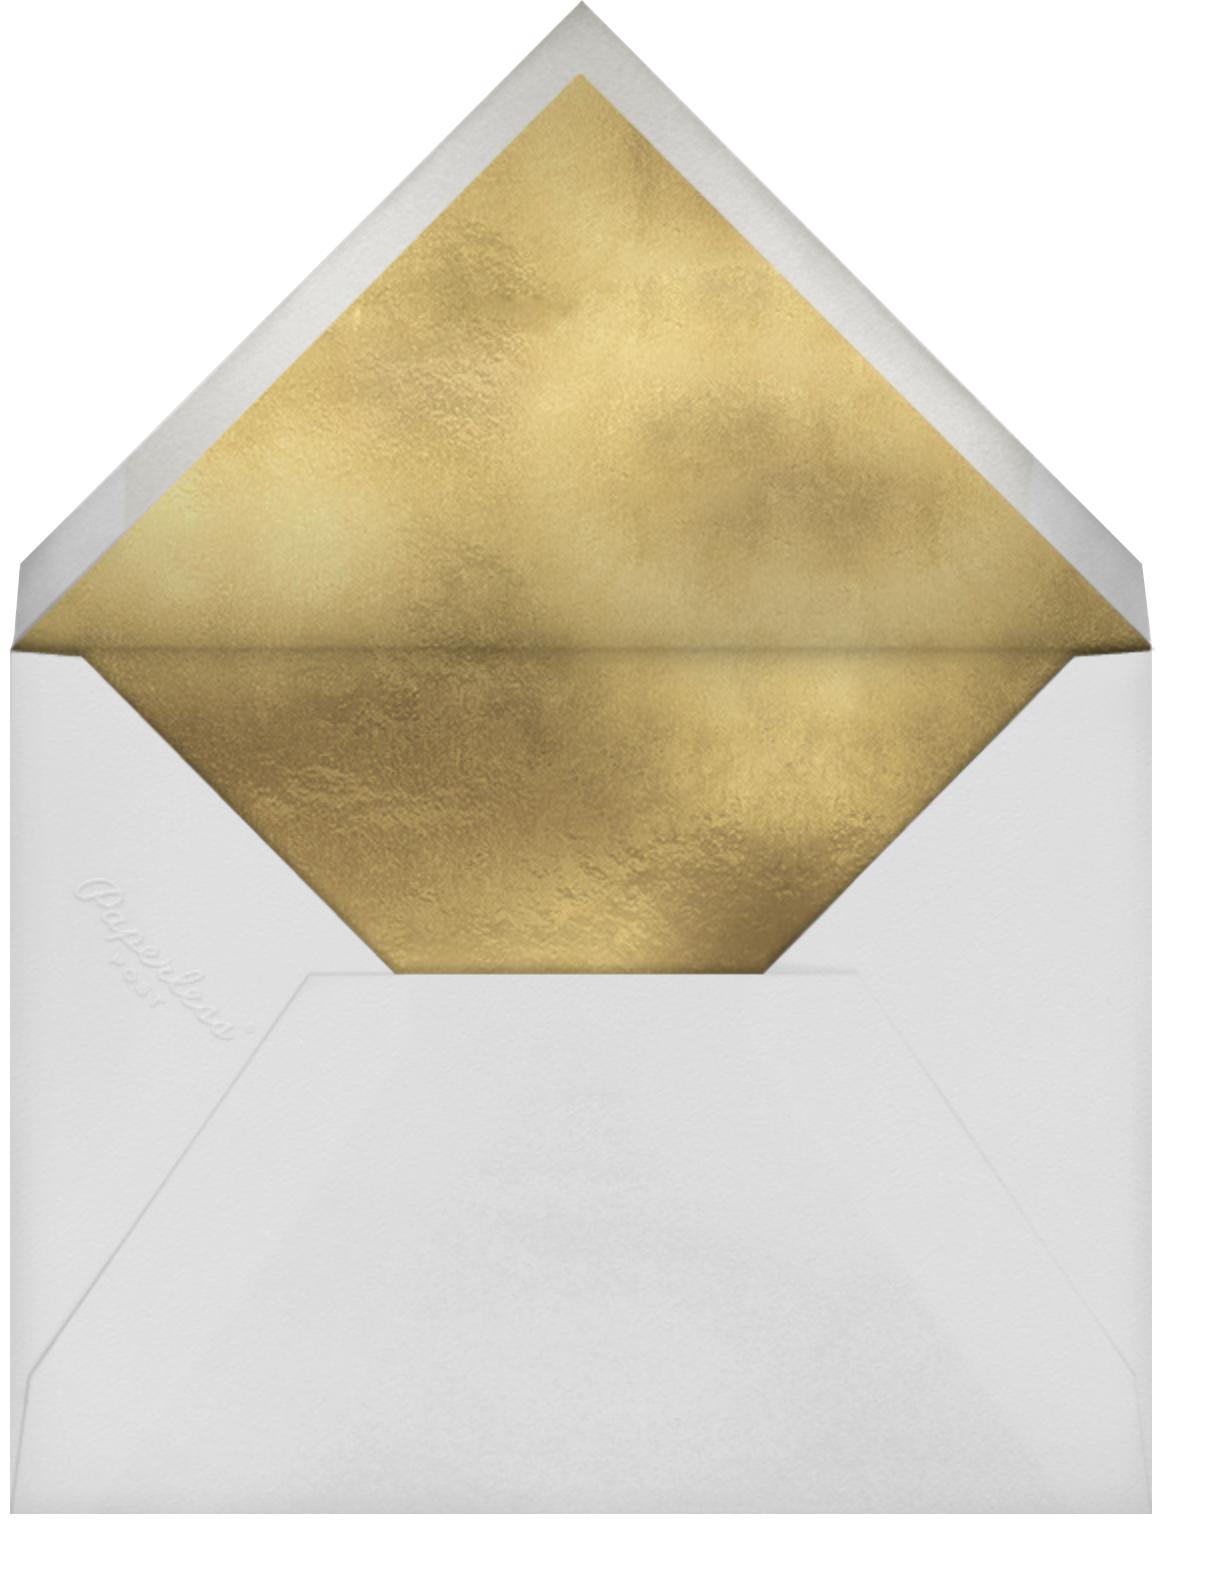 Champ Flute - kate spade new york - Engagement party - envelope back